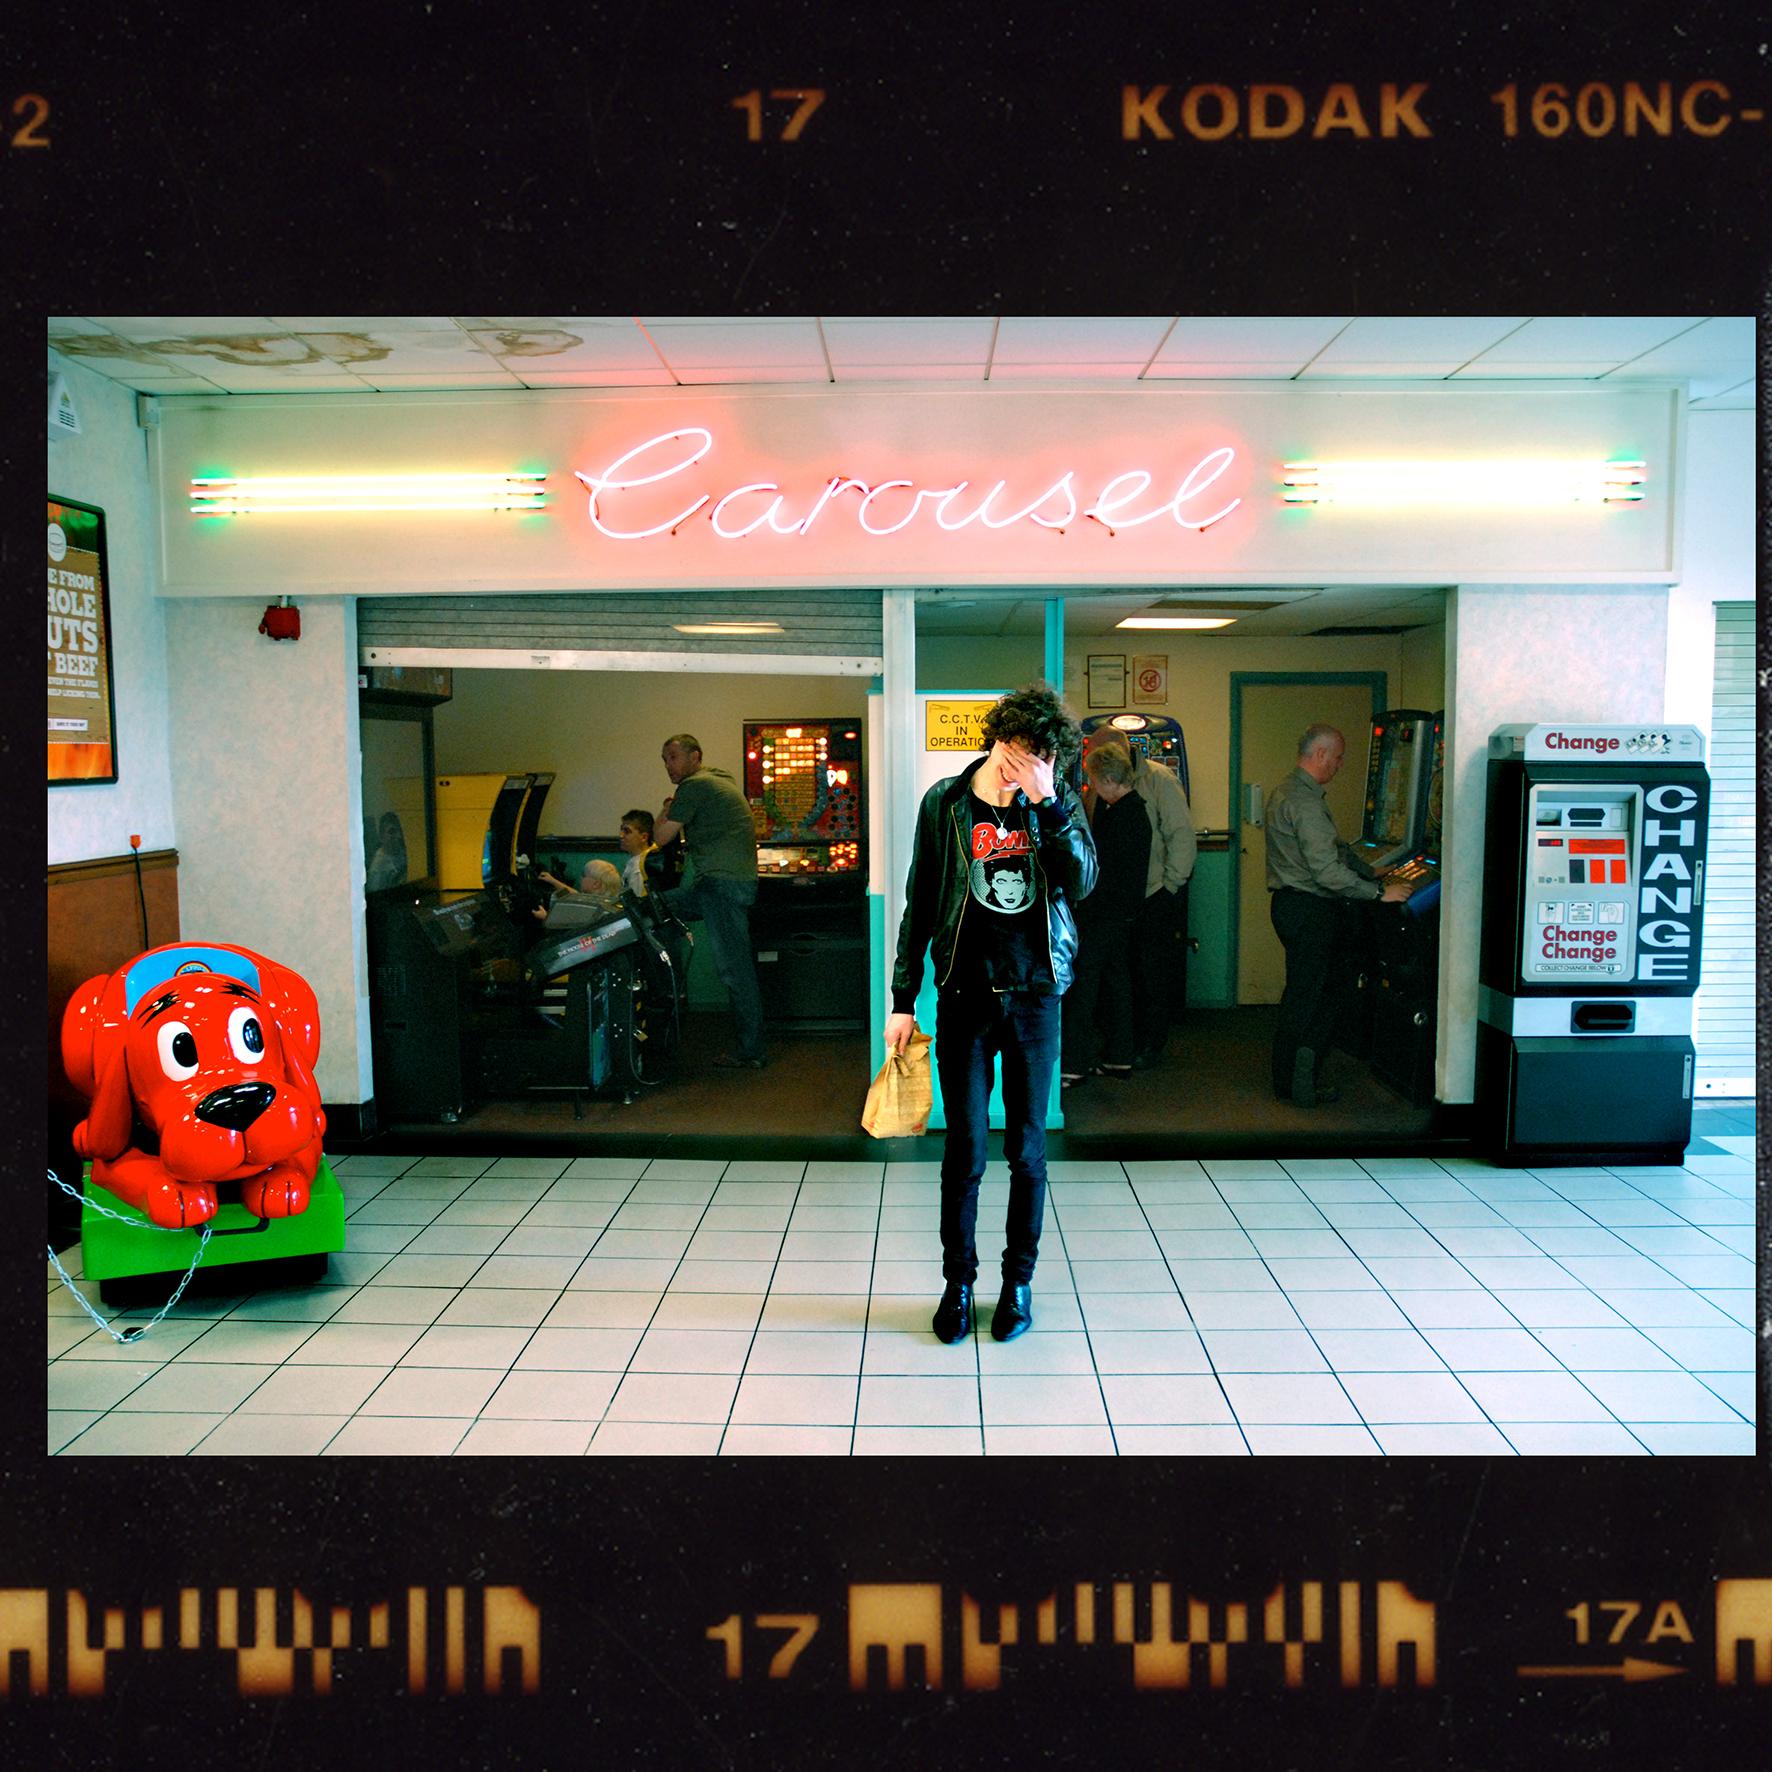 17_daniel service station copy.jpg